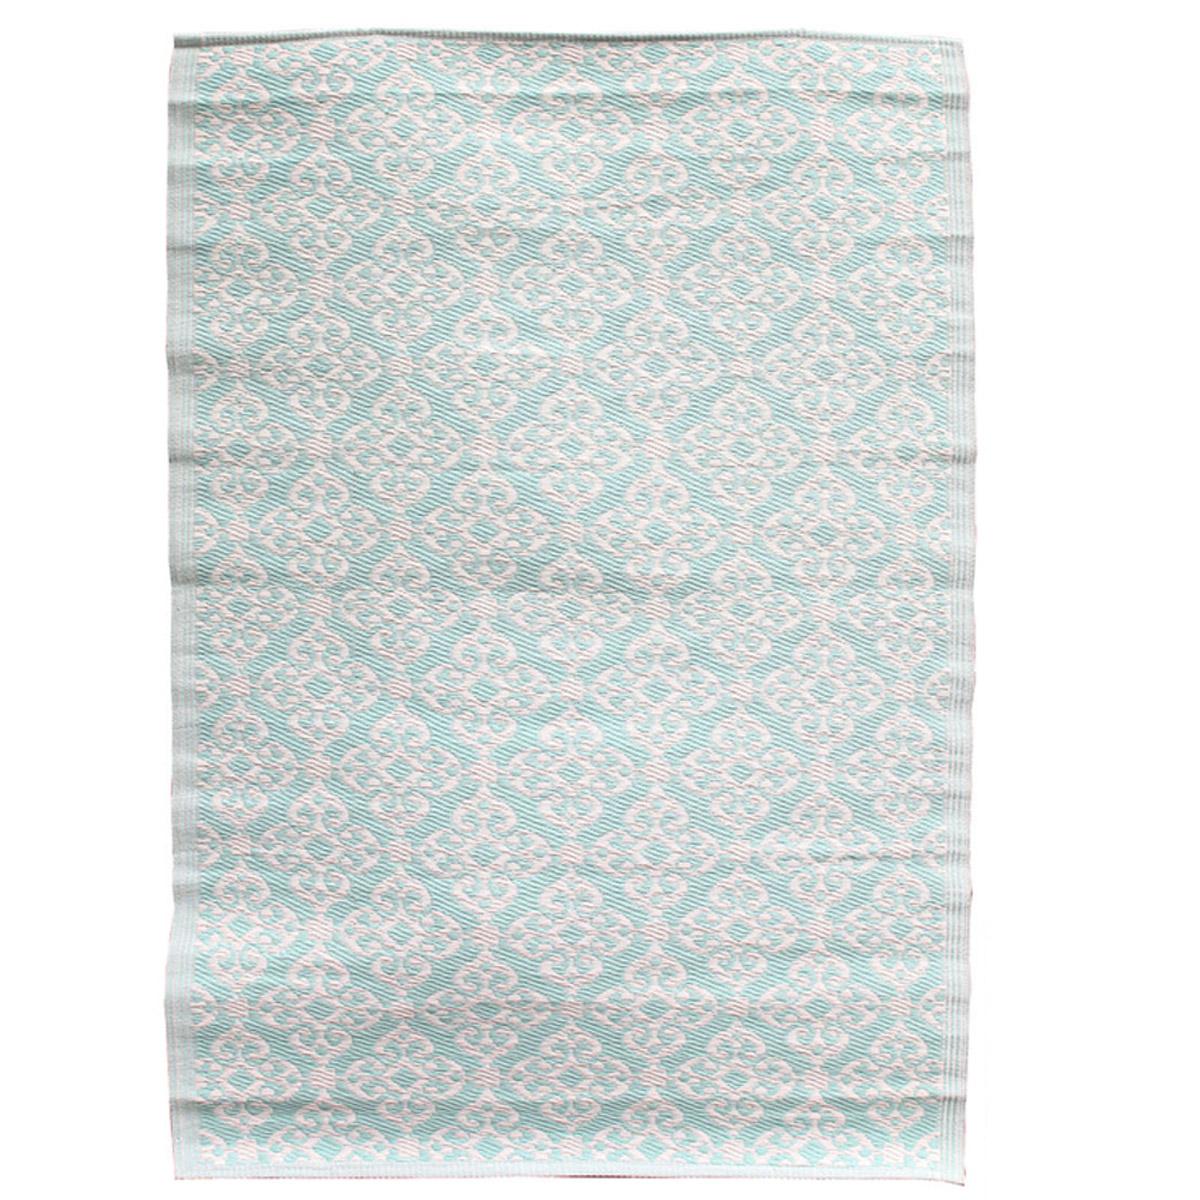 Tapis indoor outdoor \'Boho\' turquoise - 180x120 cm - [R2504]